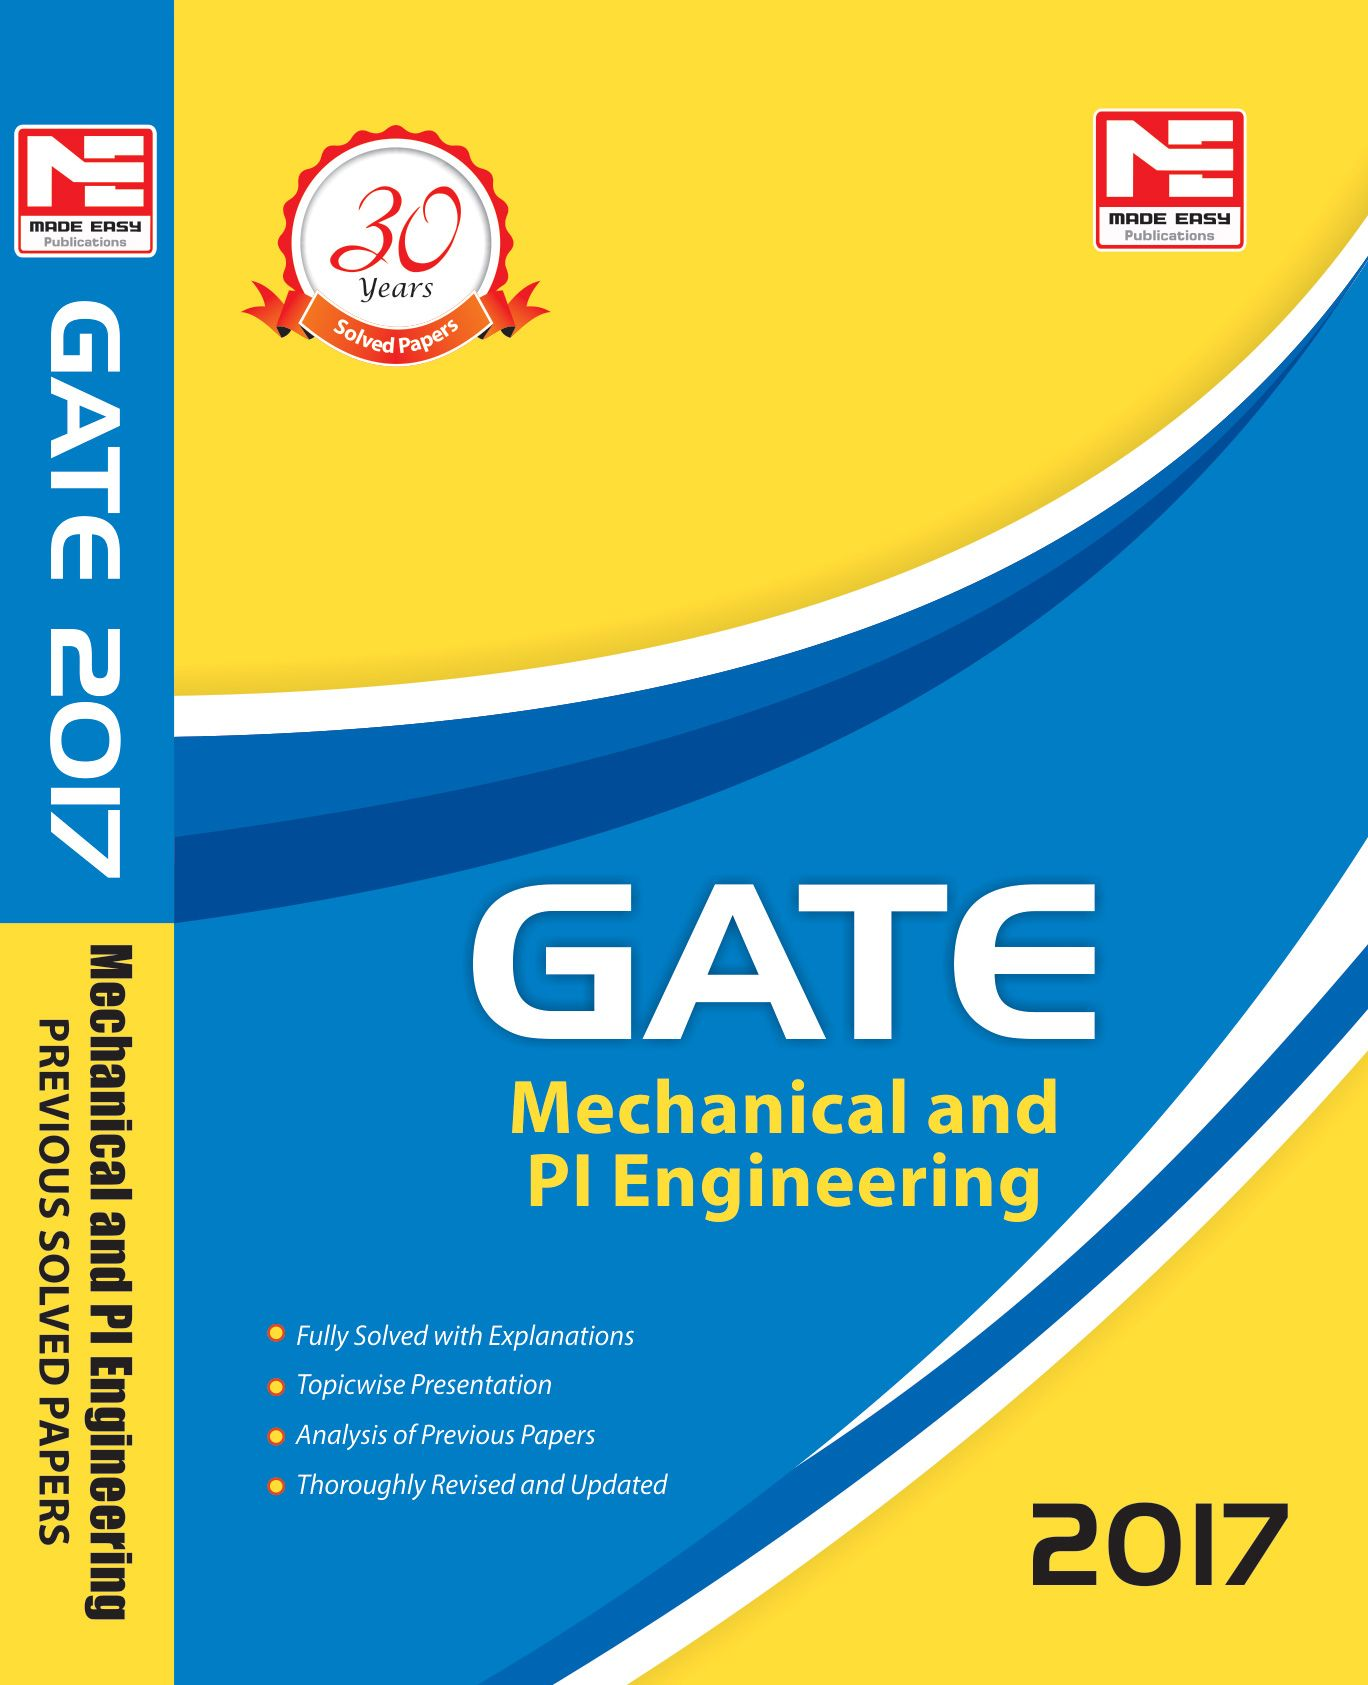 Pin by Ramesh on Pdf | Mechanical engineering, Gate exam